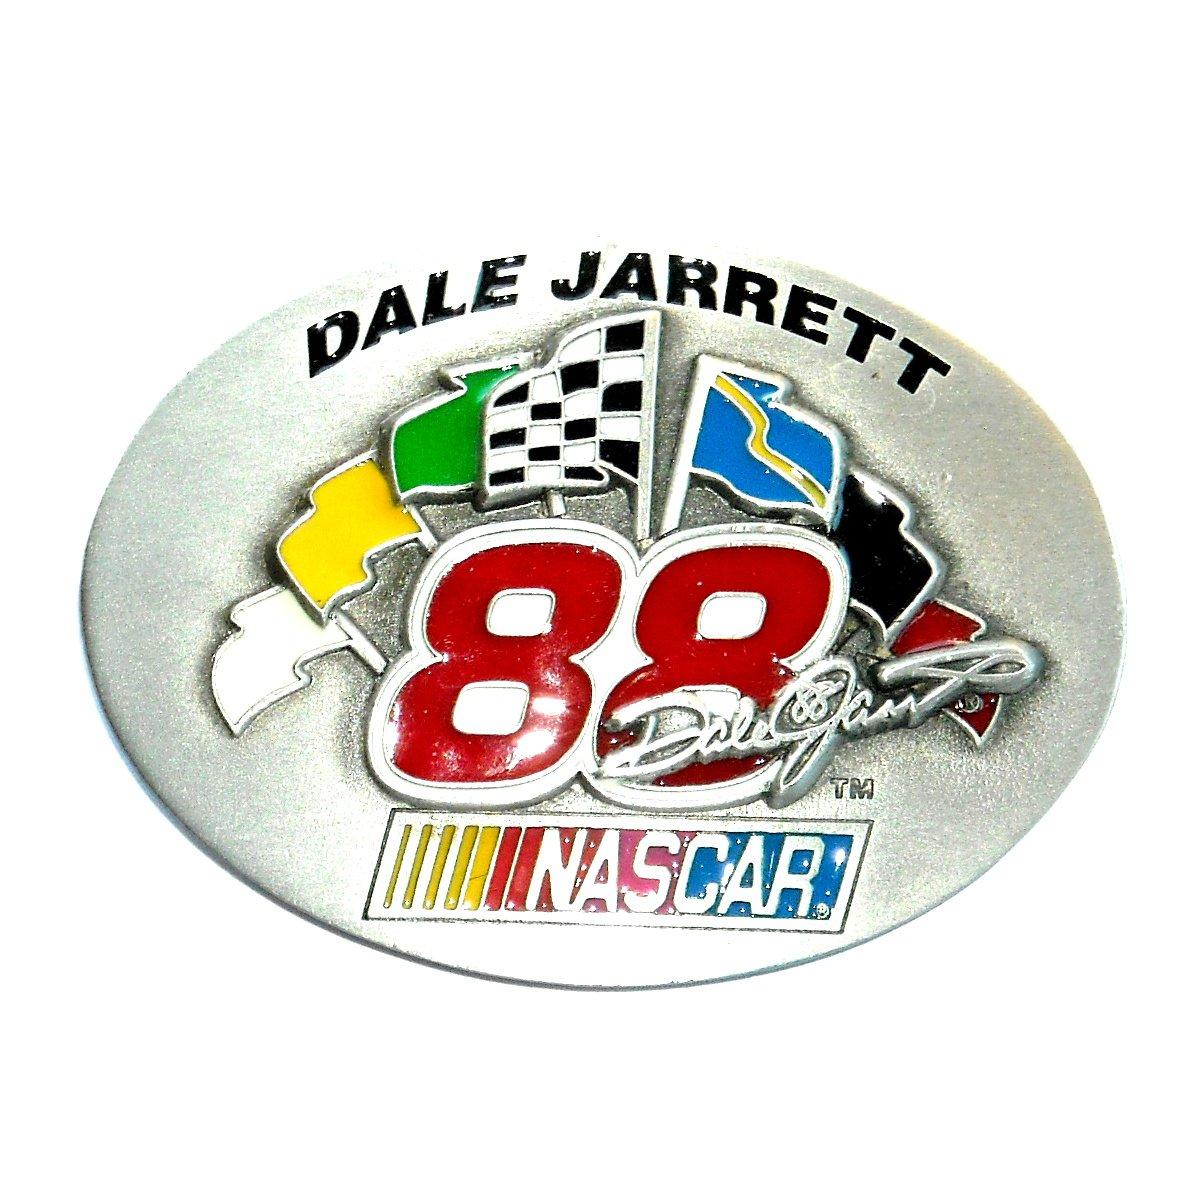 Nascar Dale Jarrett 88 Ford Great American Products Belt Buckle